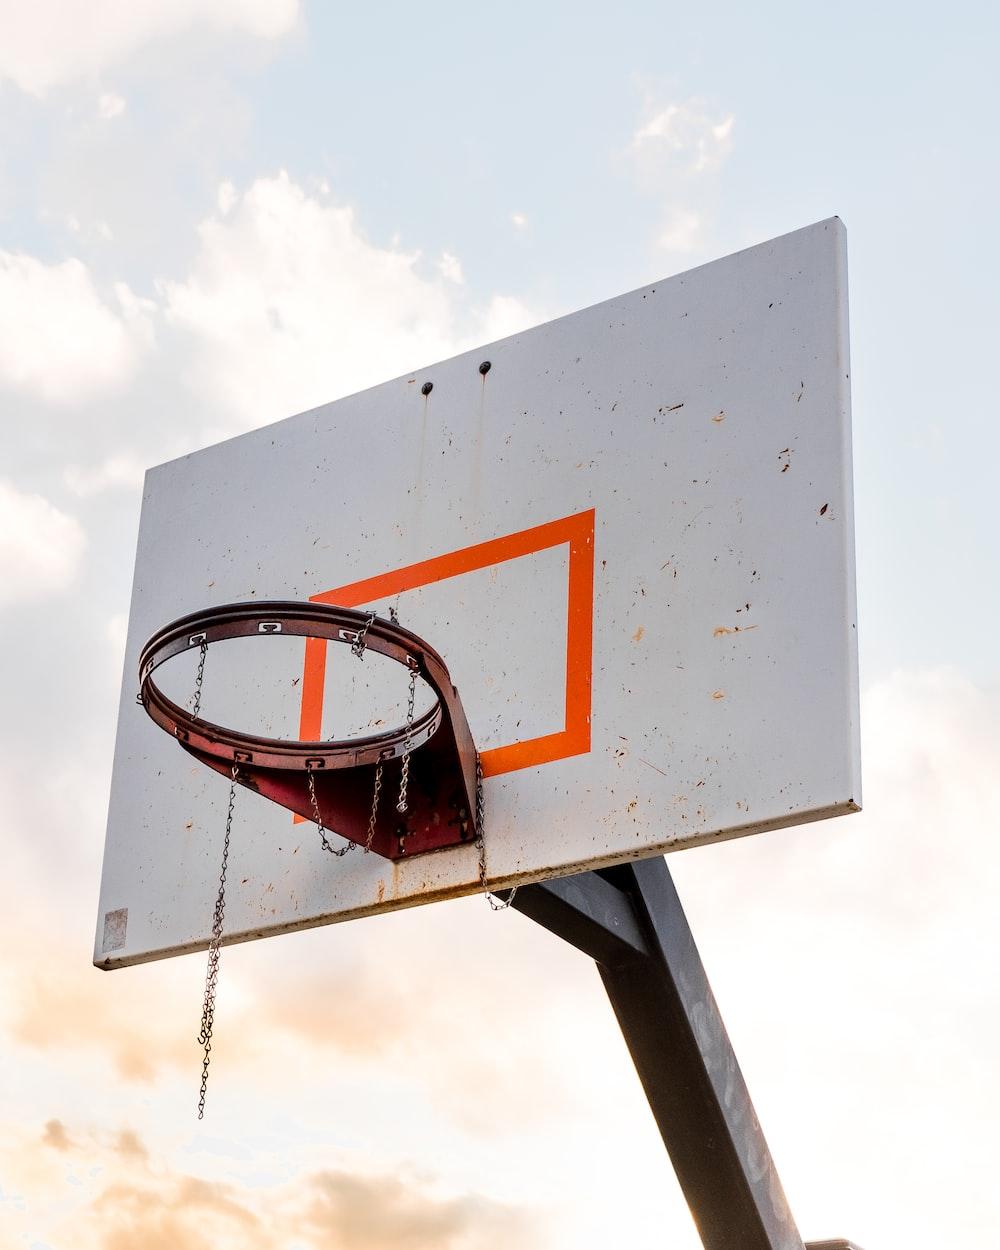 orange steel basketball hoop mounted on white wooden basketball hoop board